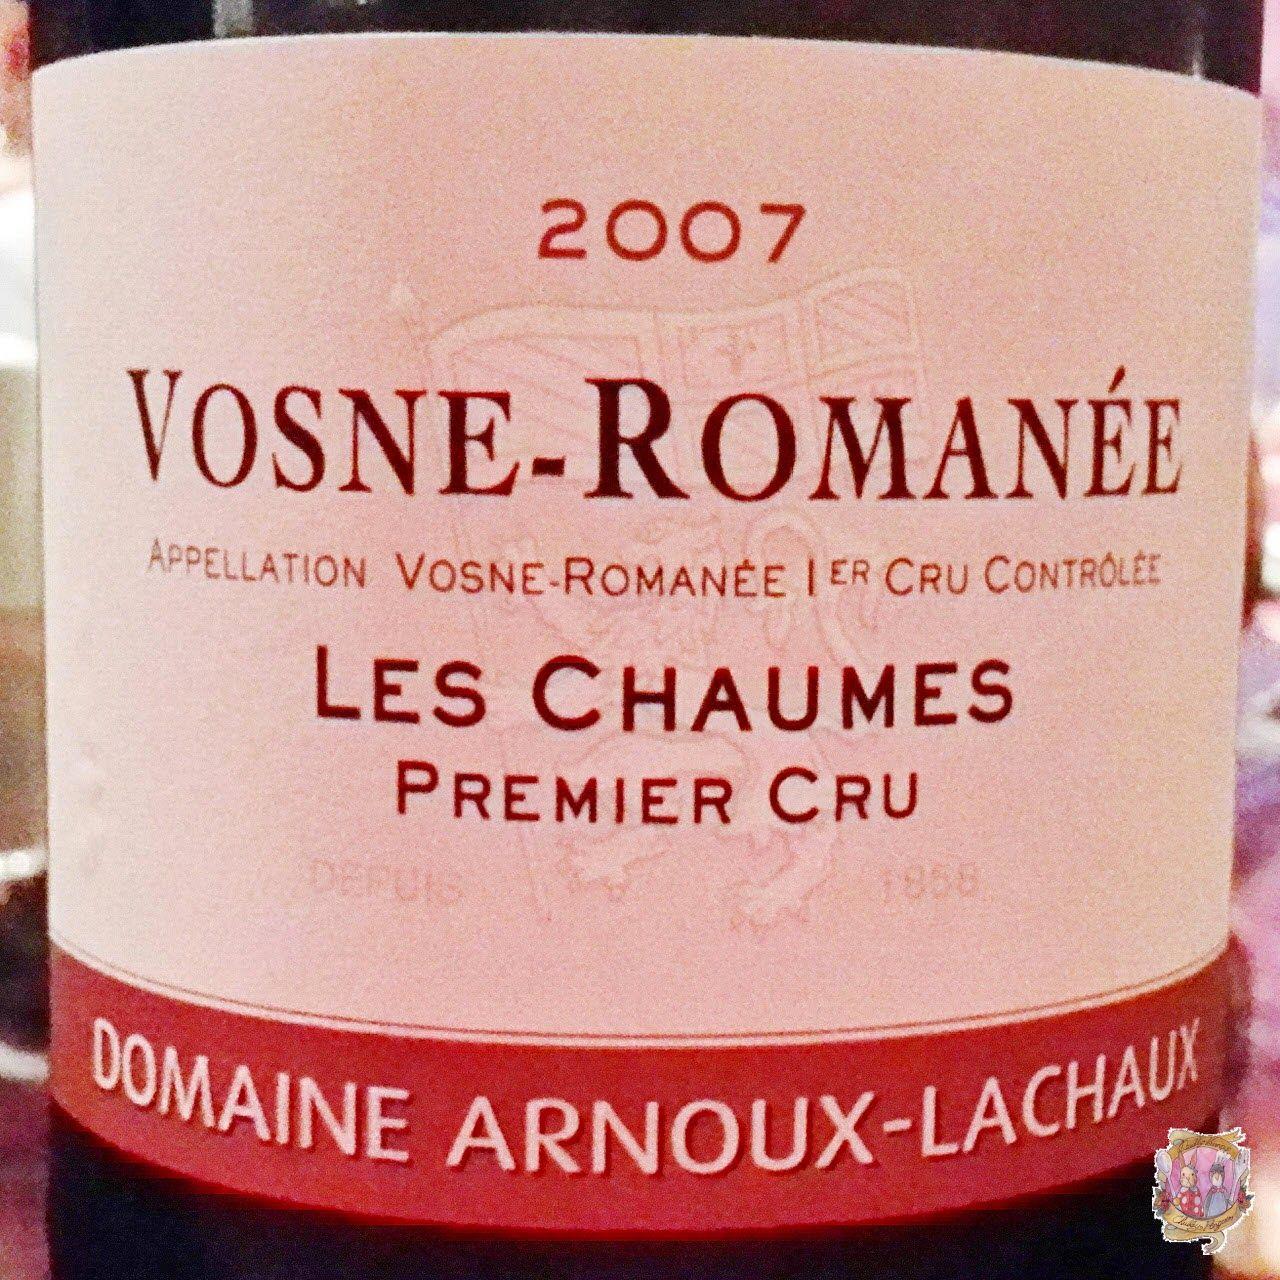 Domaine Arnoux Lachaux Vosne Romanee 1er Cru Les Chaumes 2007 Arnouxlachaux Vosneromanee Burgundy Bourgogne Pinot Wine Bottle Rose Wine Bottle Red Grapes